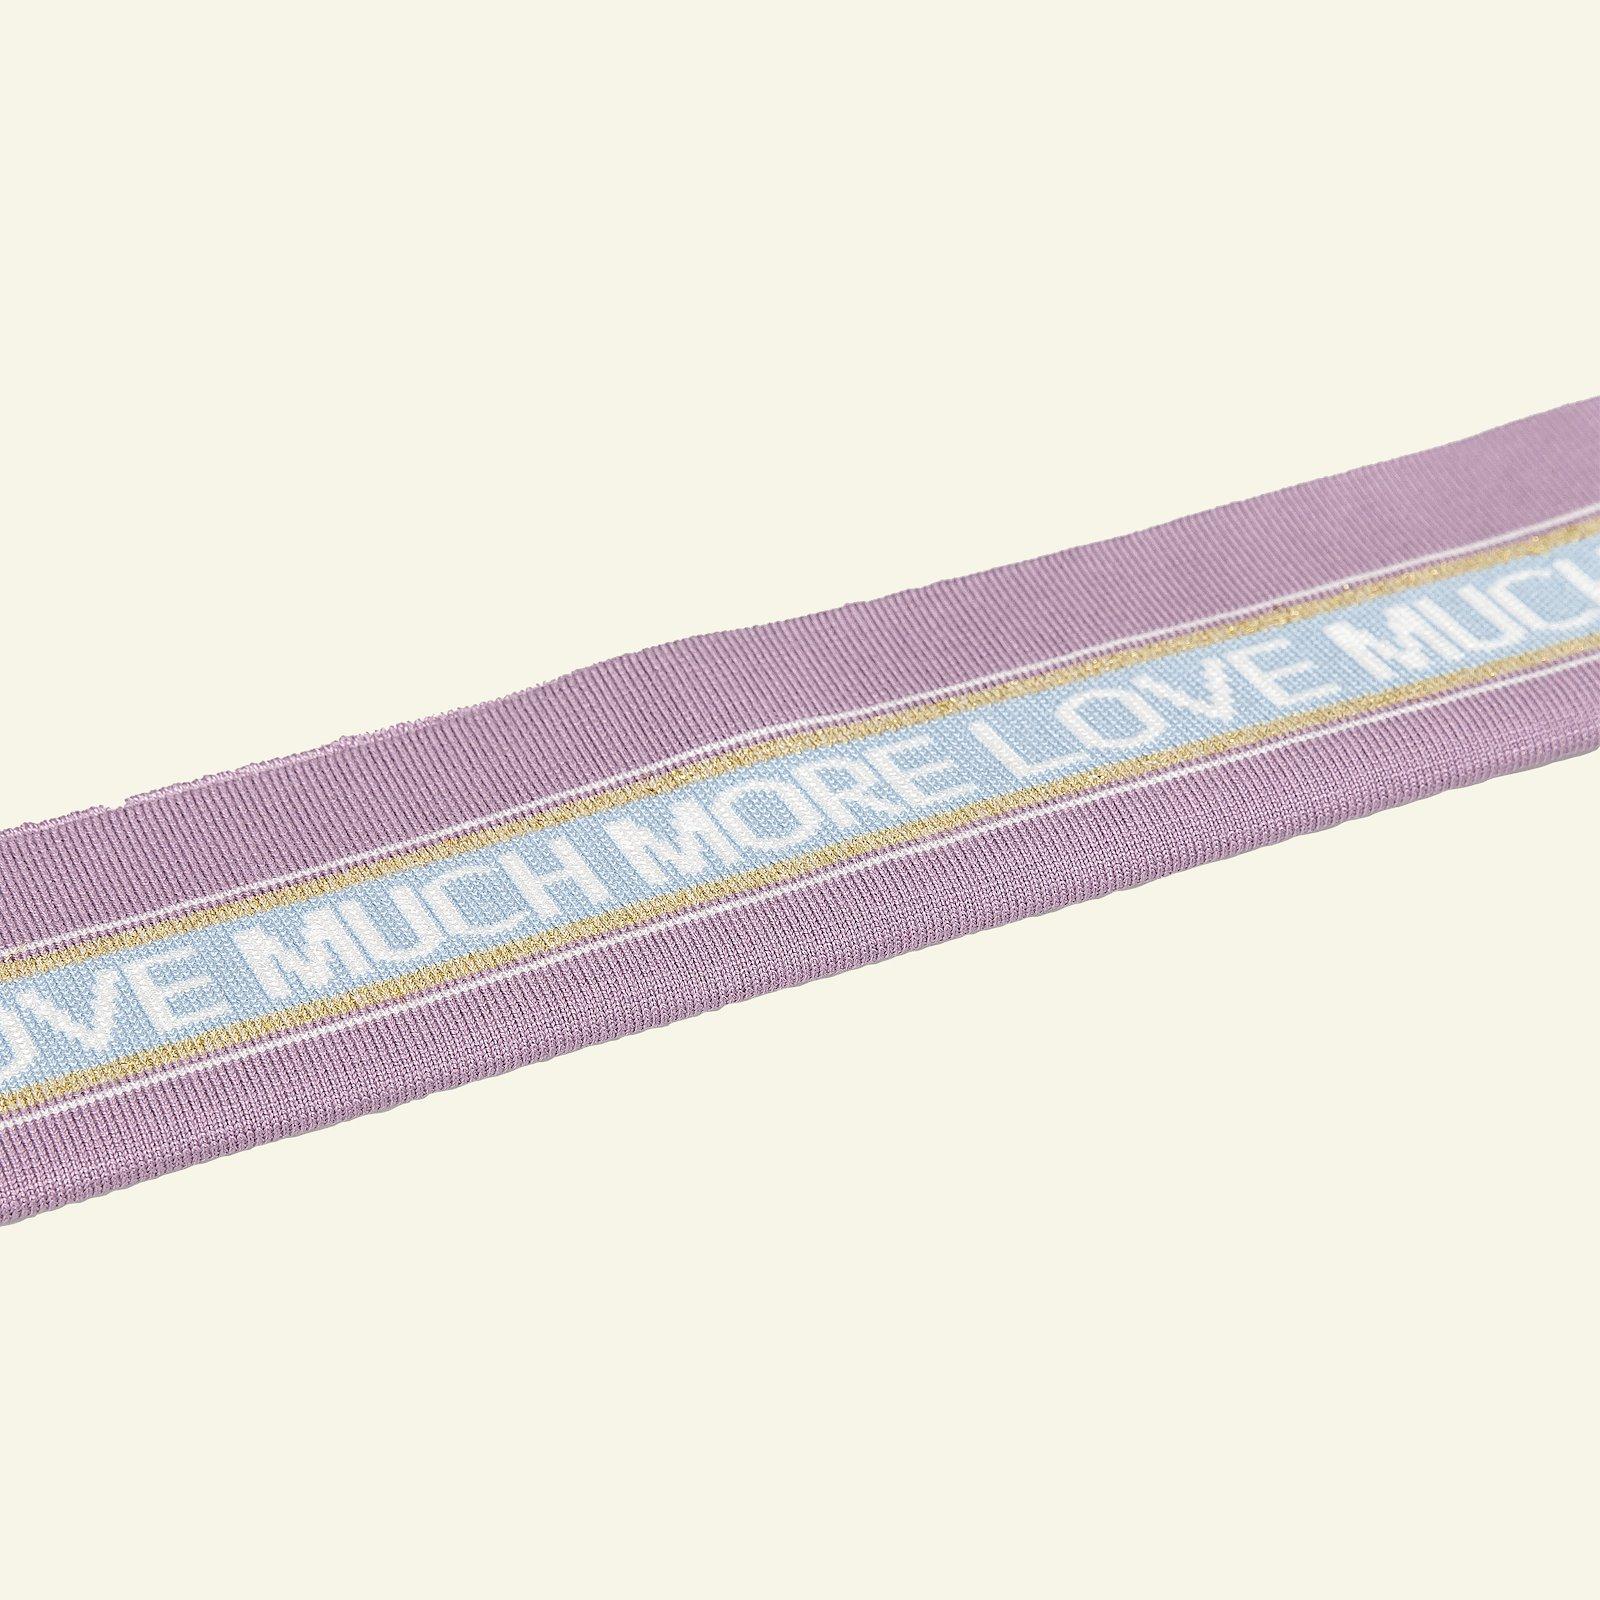 1x1 rib fold 14x100cm dusty pink 1pc 96187_pack_b